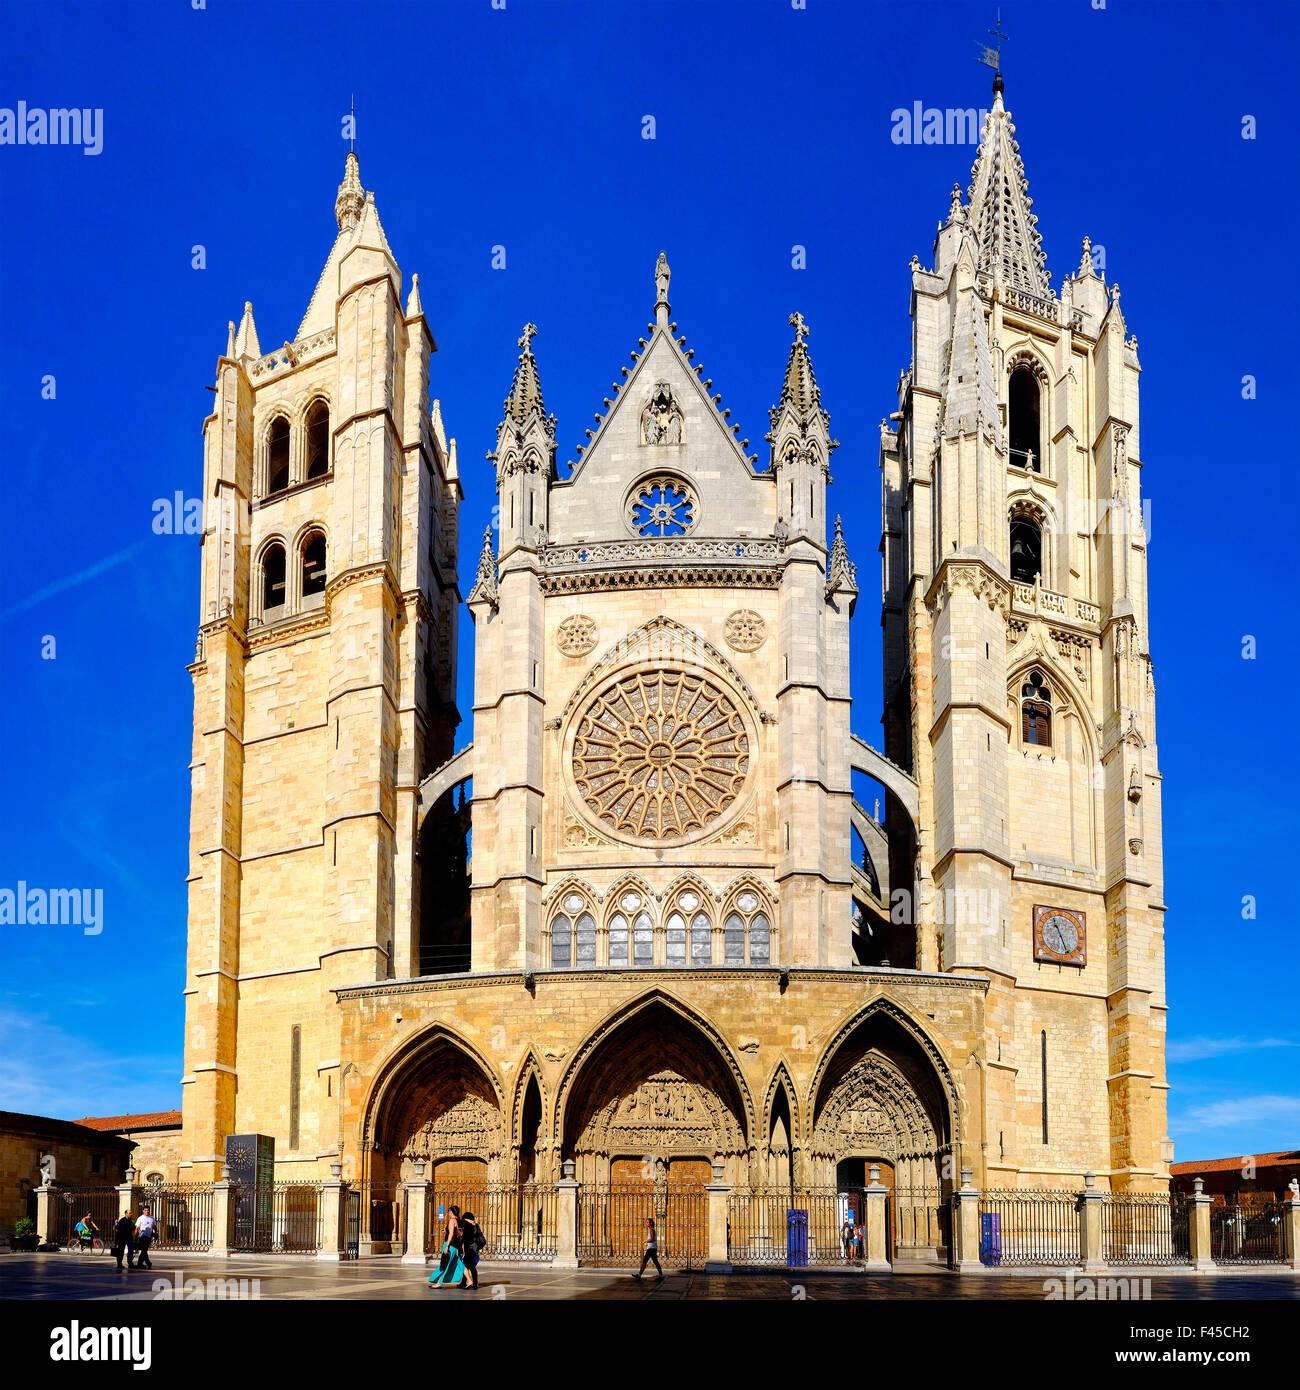 Cathedral of Santa Maria de Leon, Leon,Castile and León, Spain - Stock Image